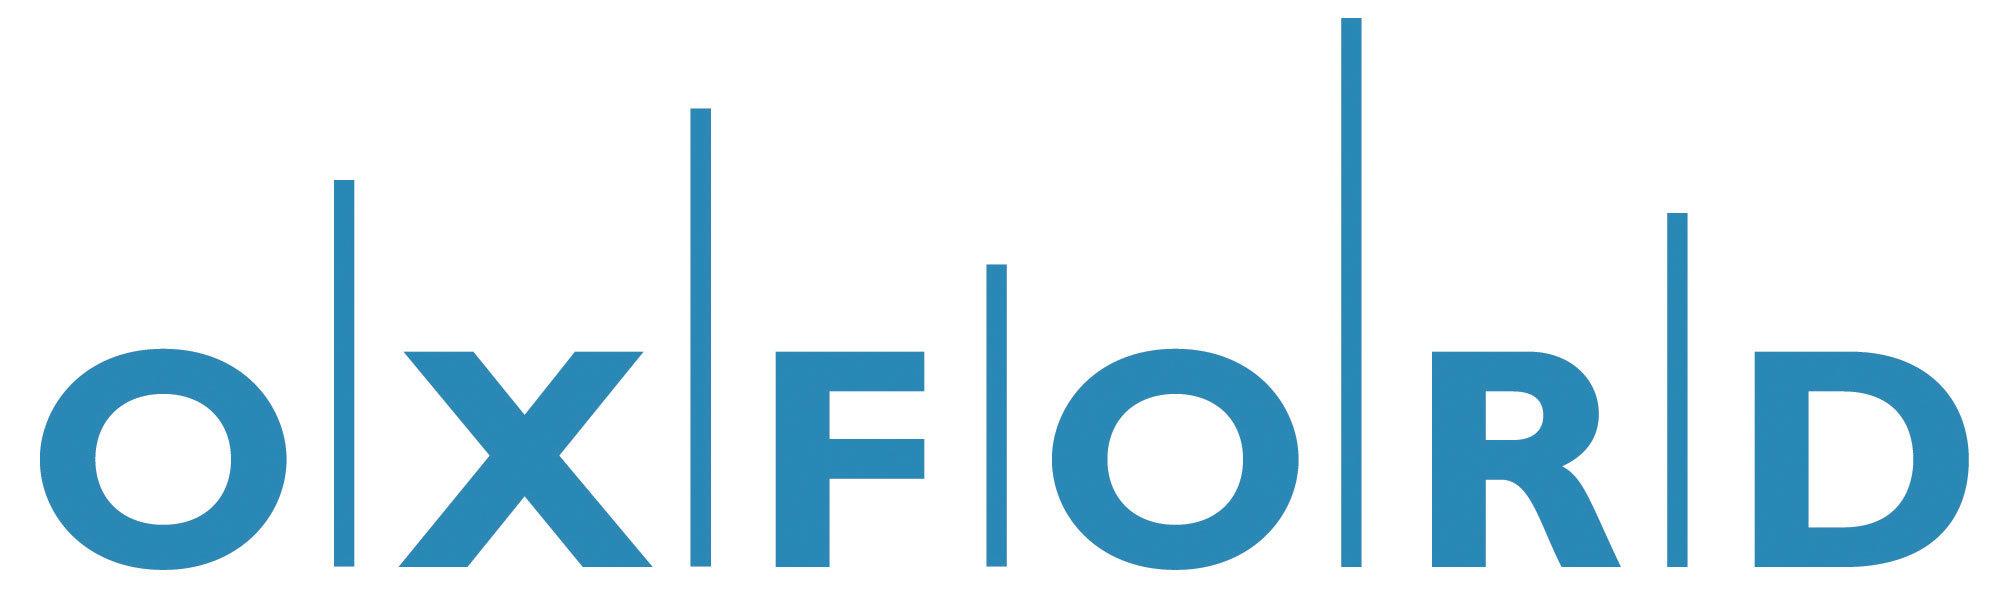 oxford_logo_blue.jpg